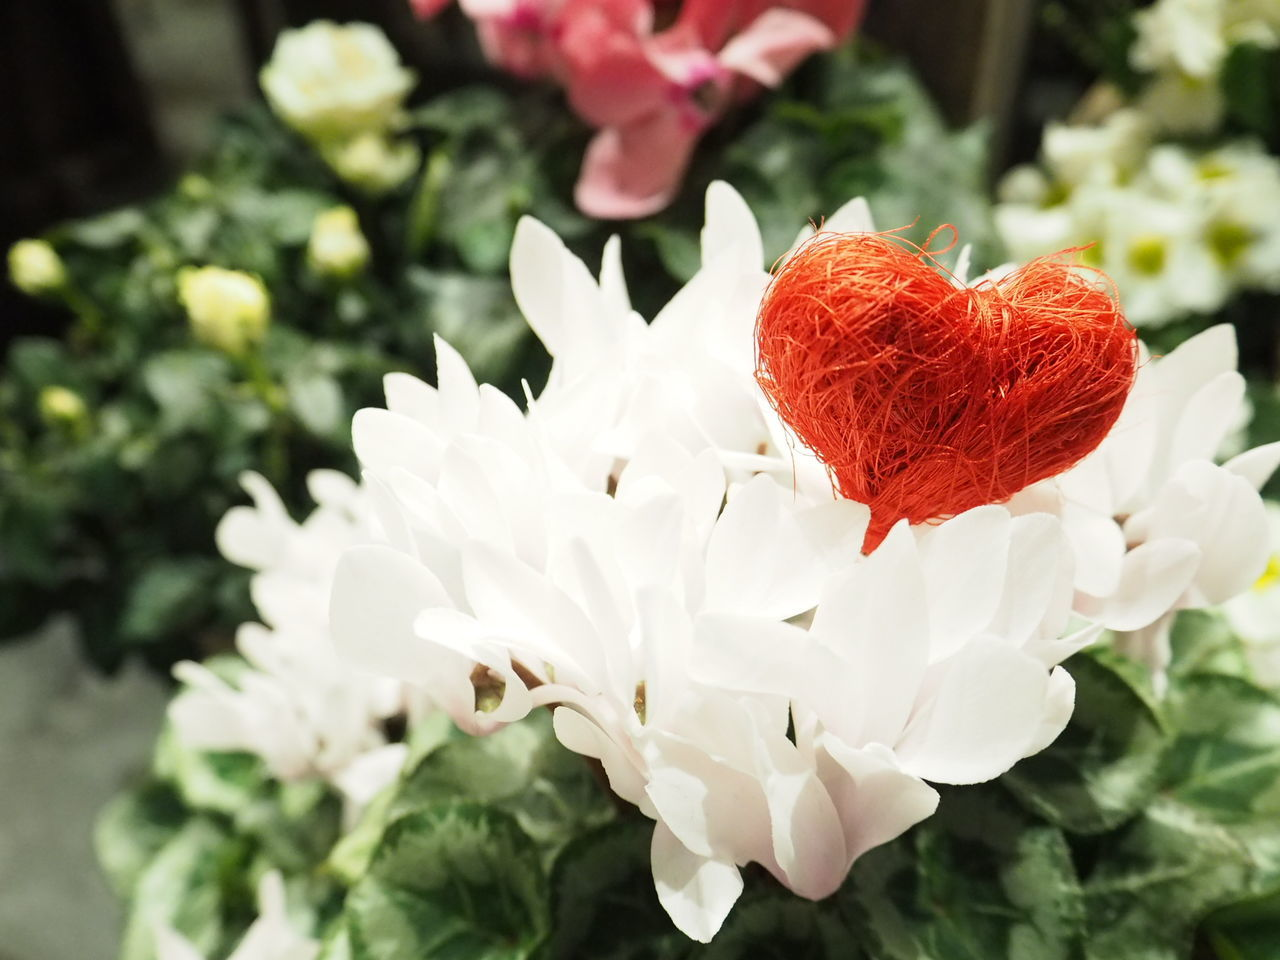 Flower Flowers Flowerporn Flower Shop Nature Heart Prevalentines Olympus Olympus Om-d E-m10 Noedit Nofilter